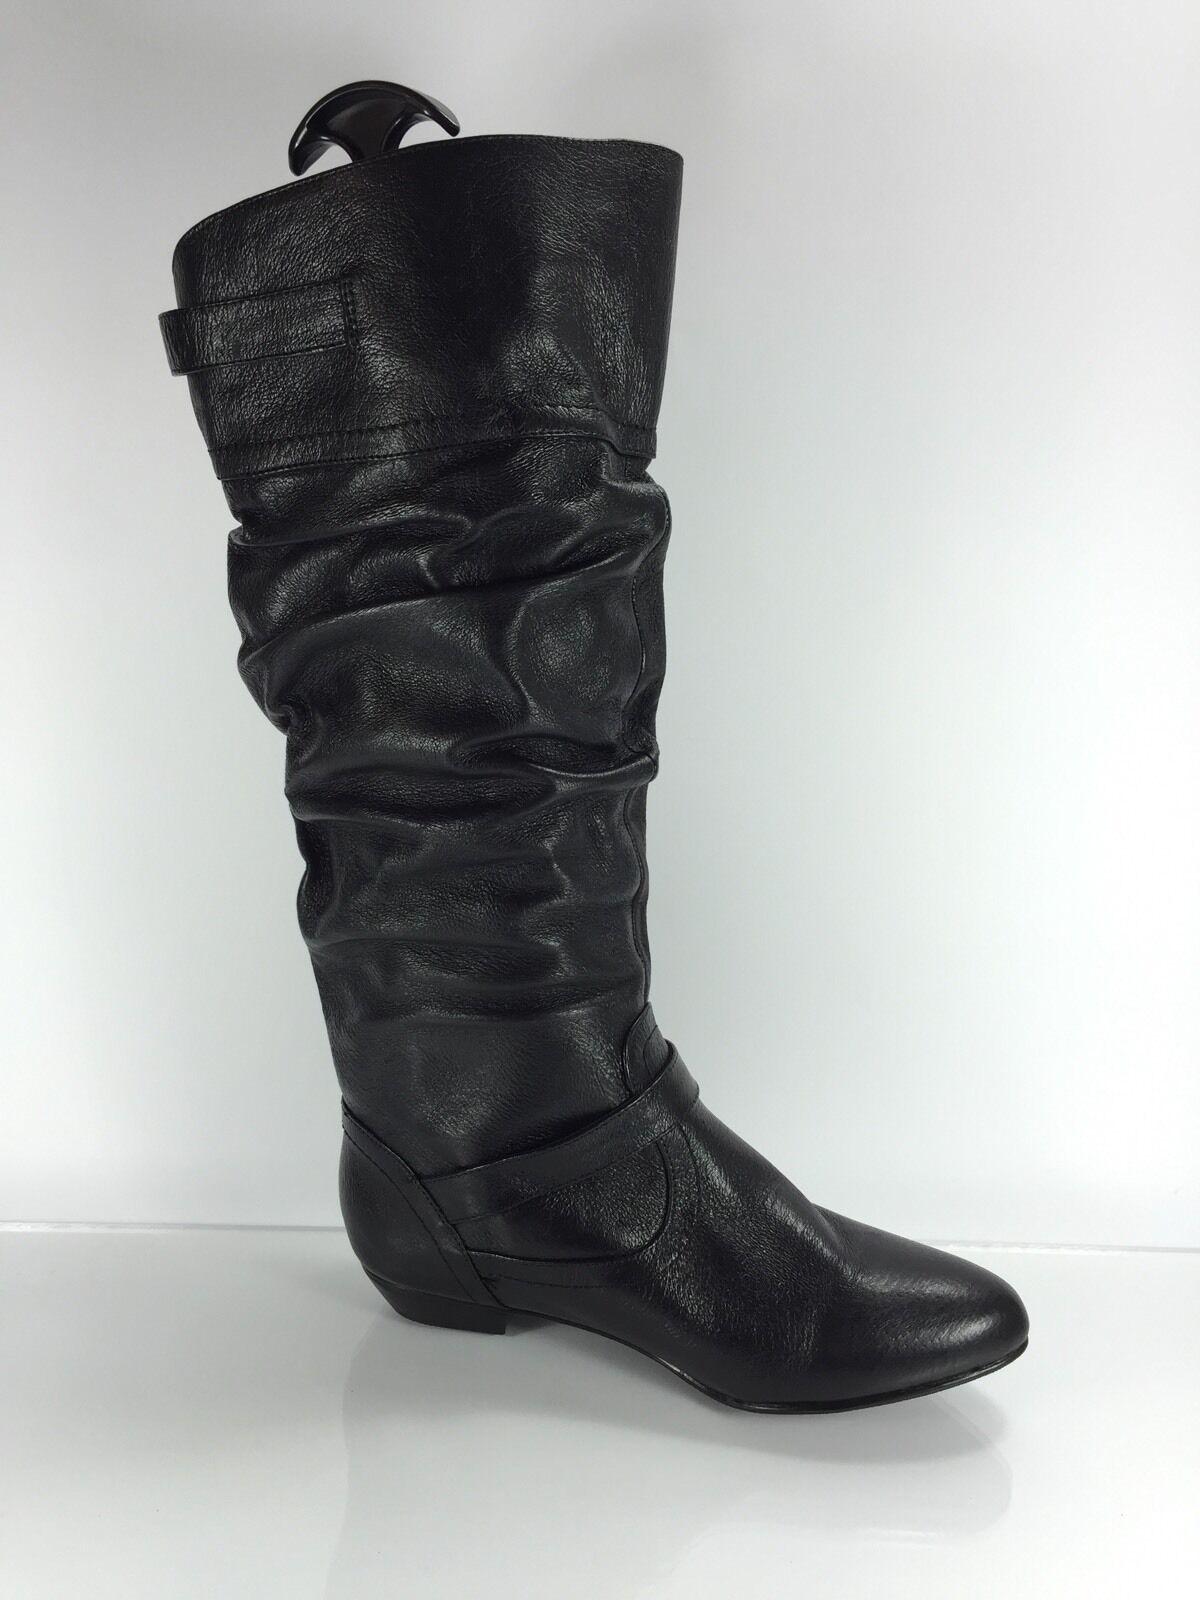 Steve Madden Para Mujer De Cuero rodilla Negro botas a la rodilla Cuero 8 M c88ffa